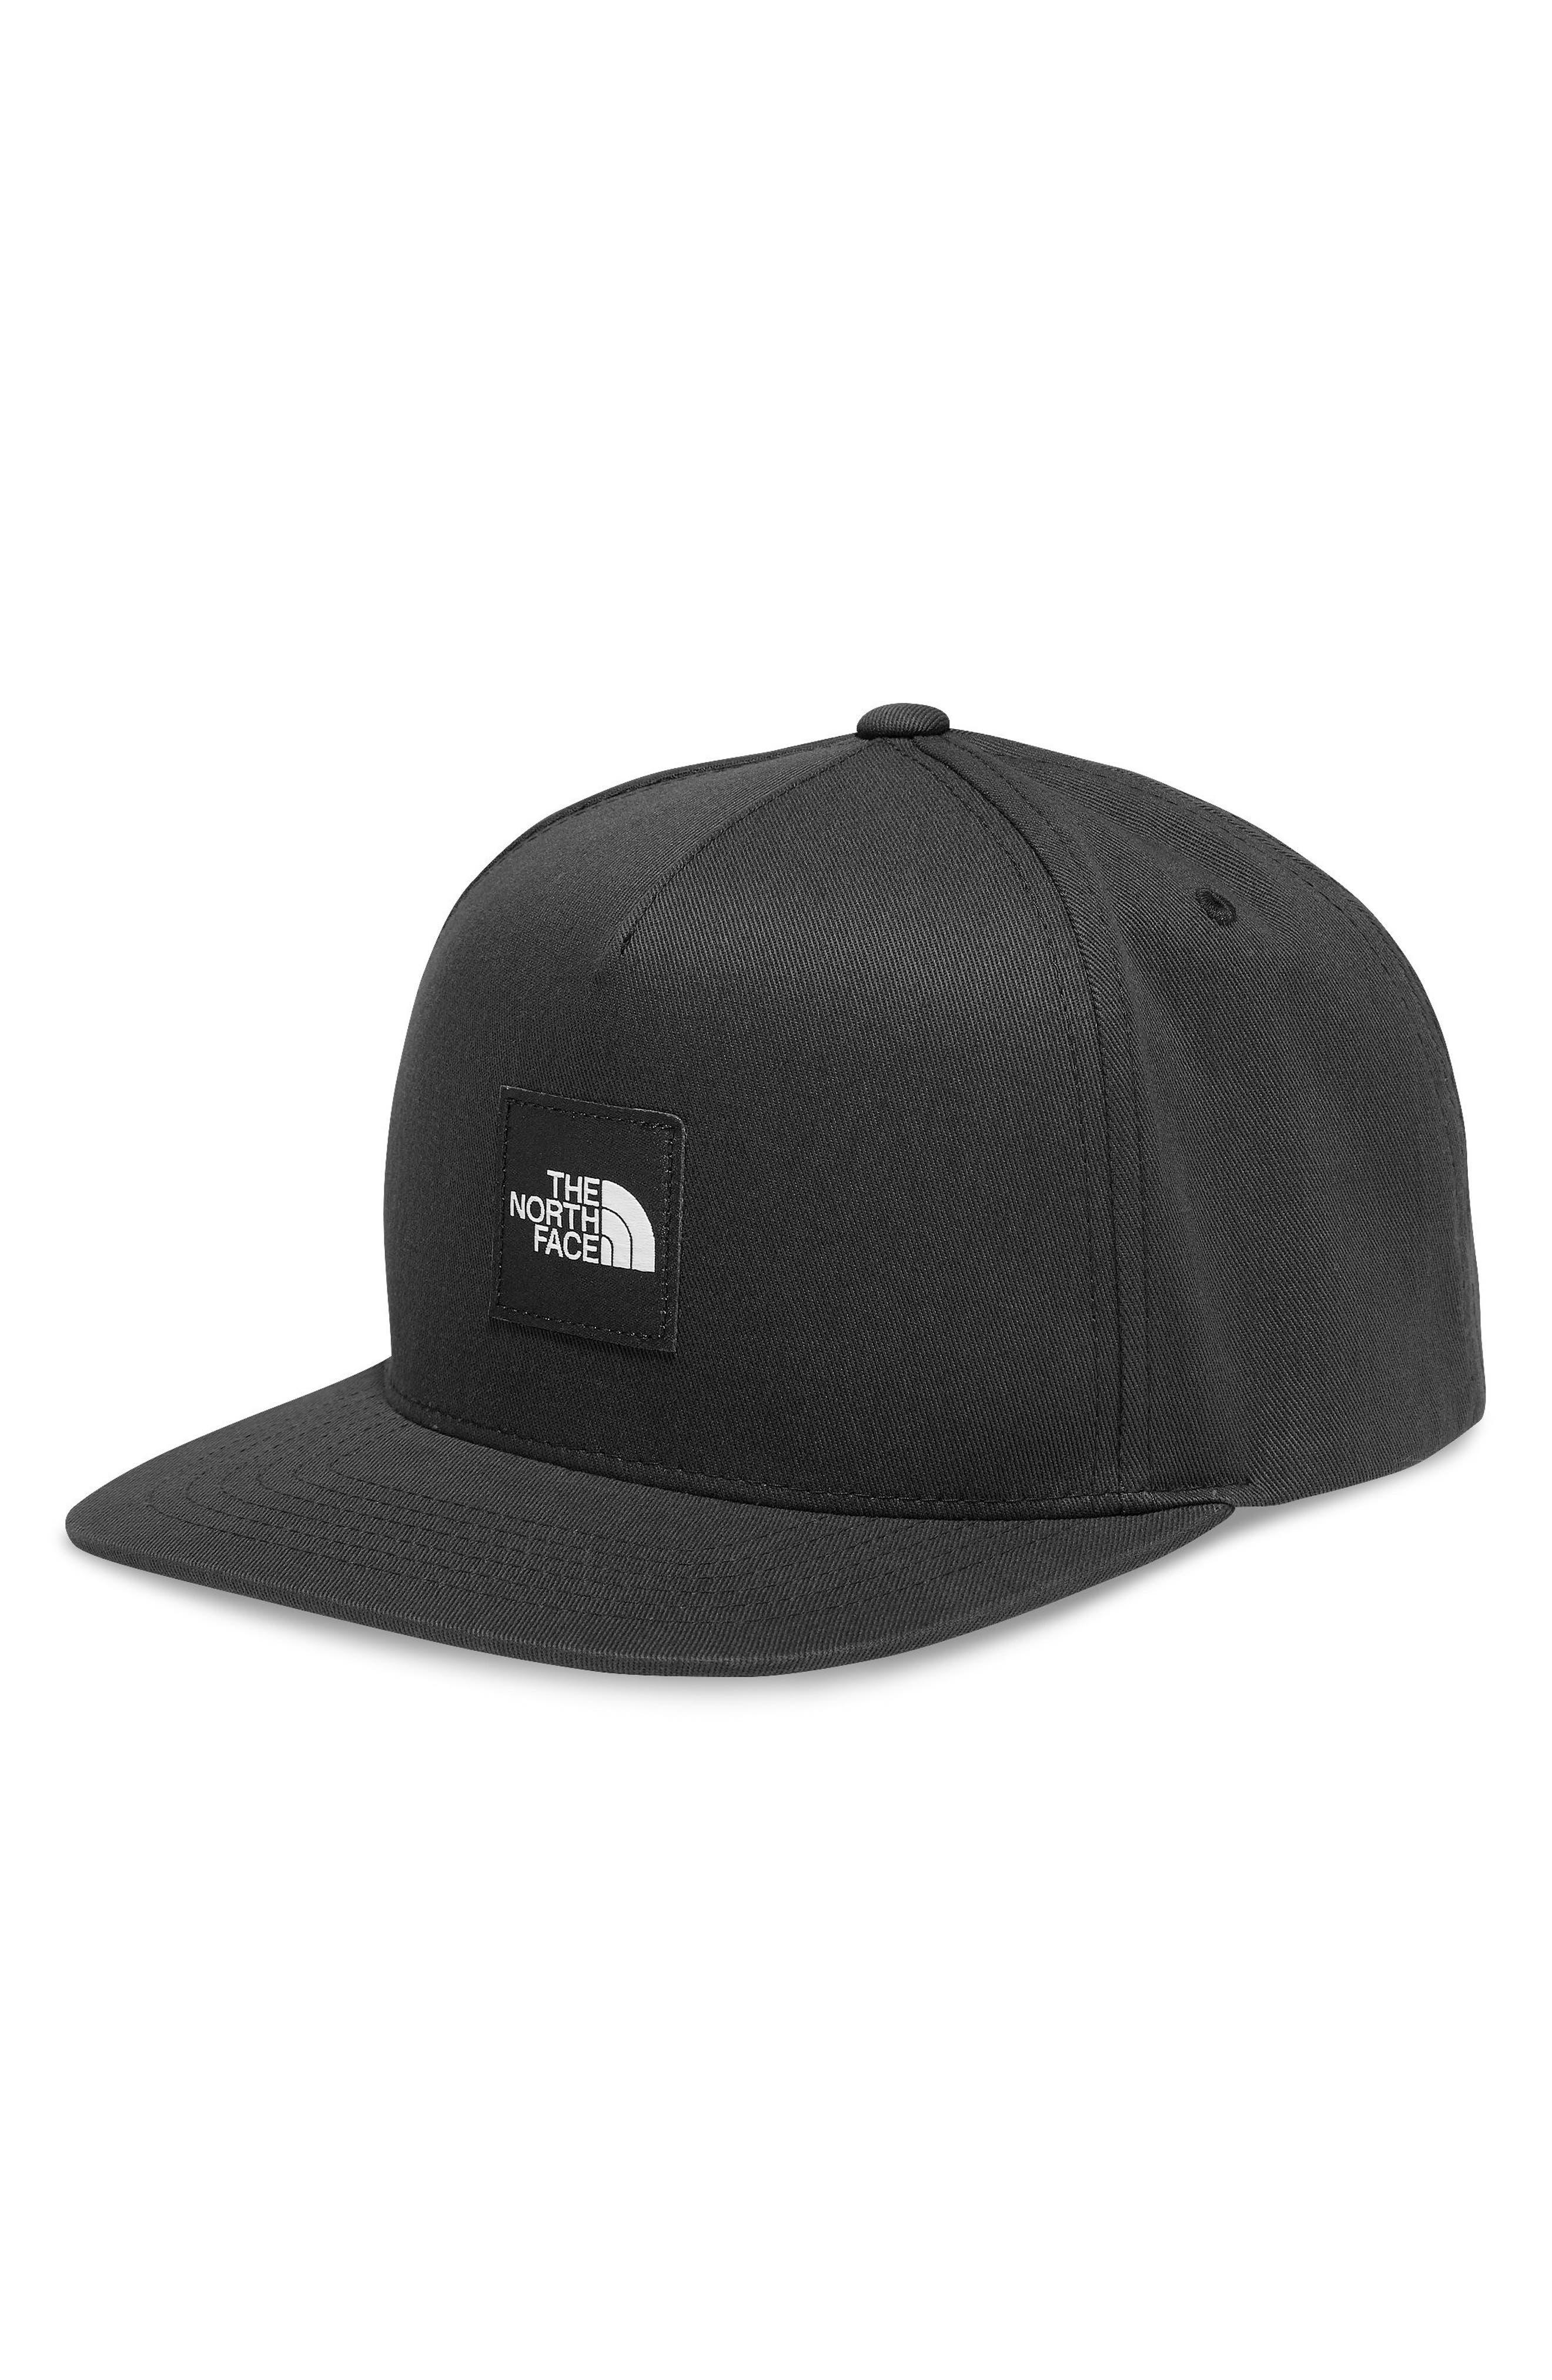 Street Baseball Cap,                         Main,                         color, TNF BLACK/ TNF BLACK